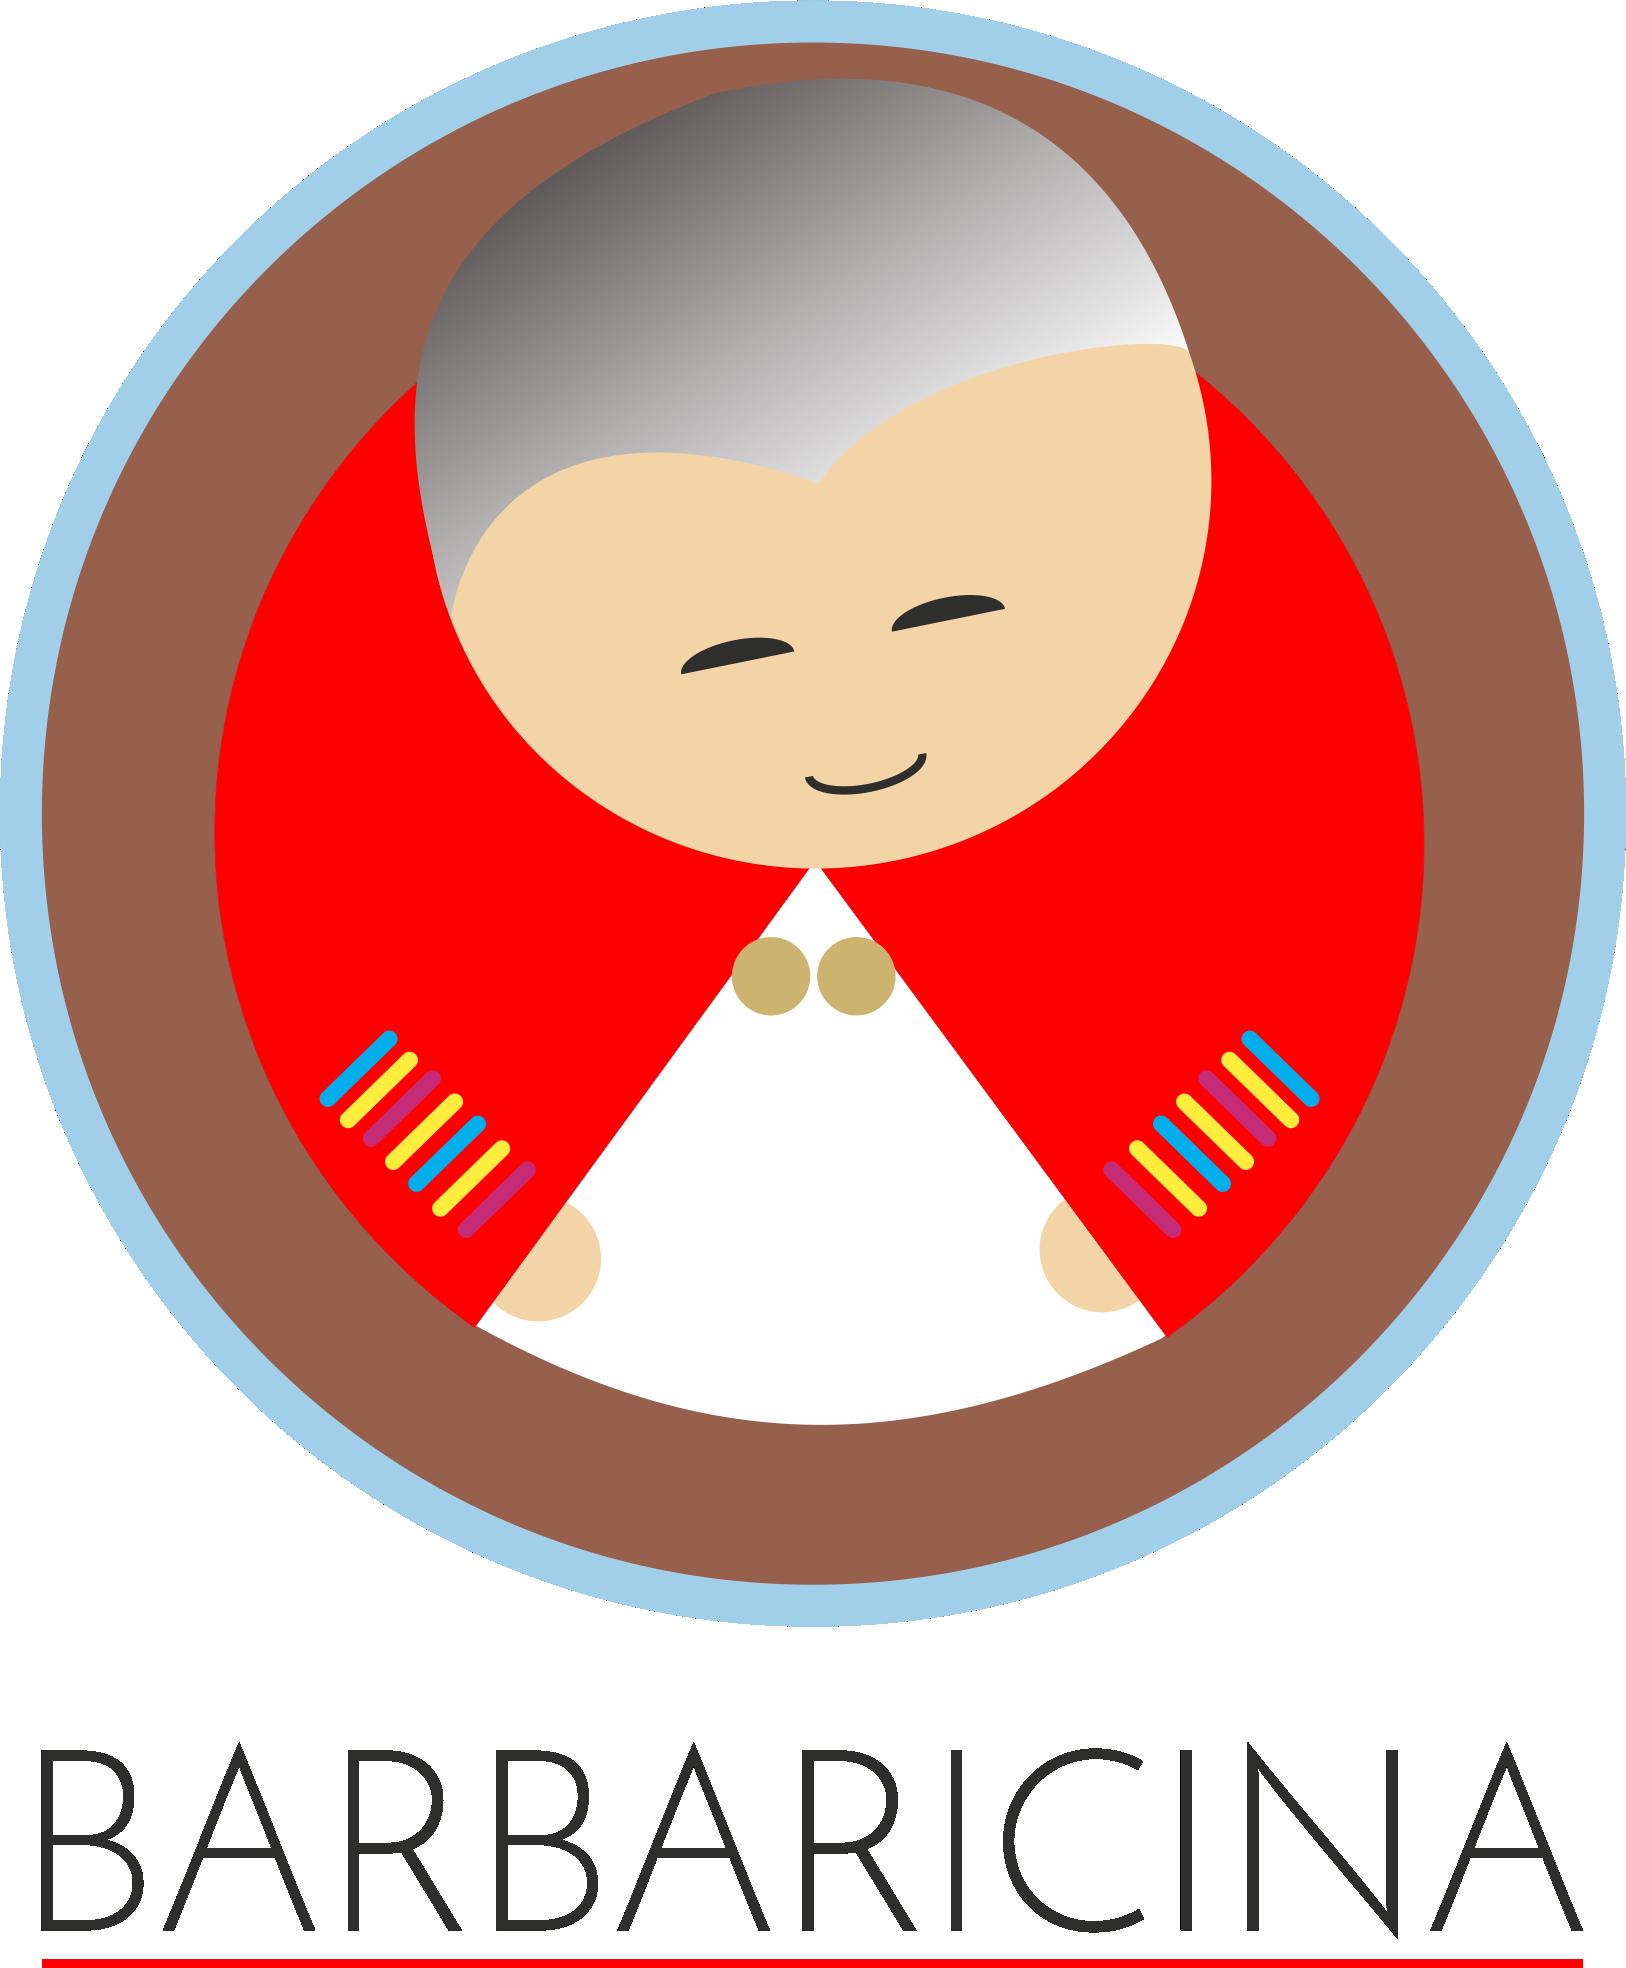 Barbaricina